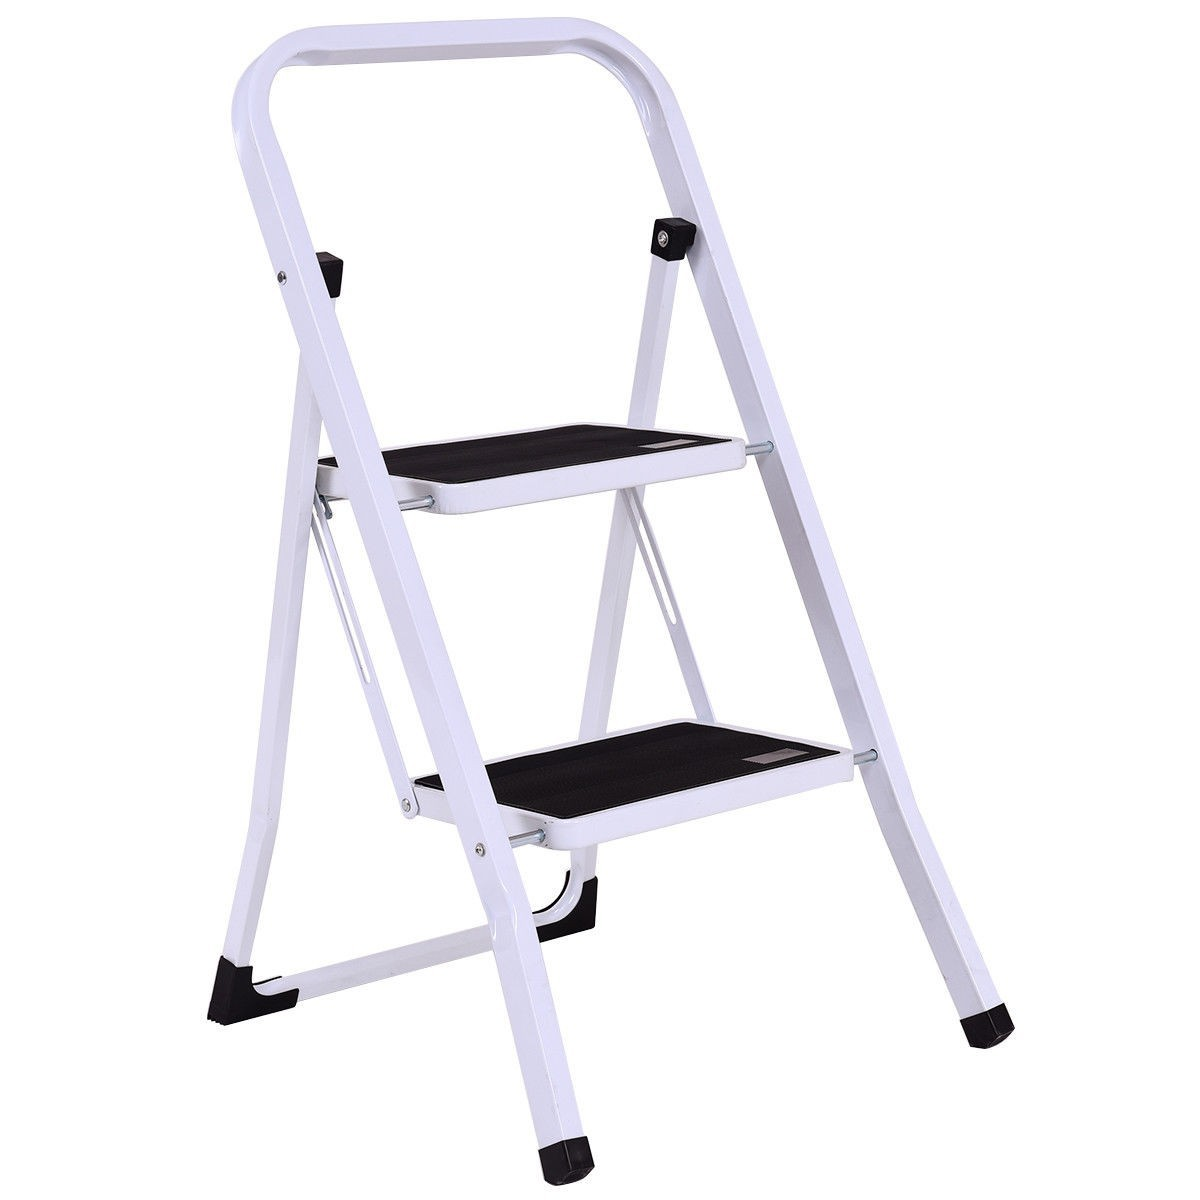 2 Step Ladder Folding Steel Step Stool Anti Slip Heavy